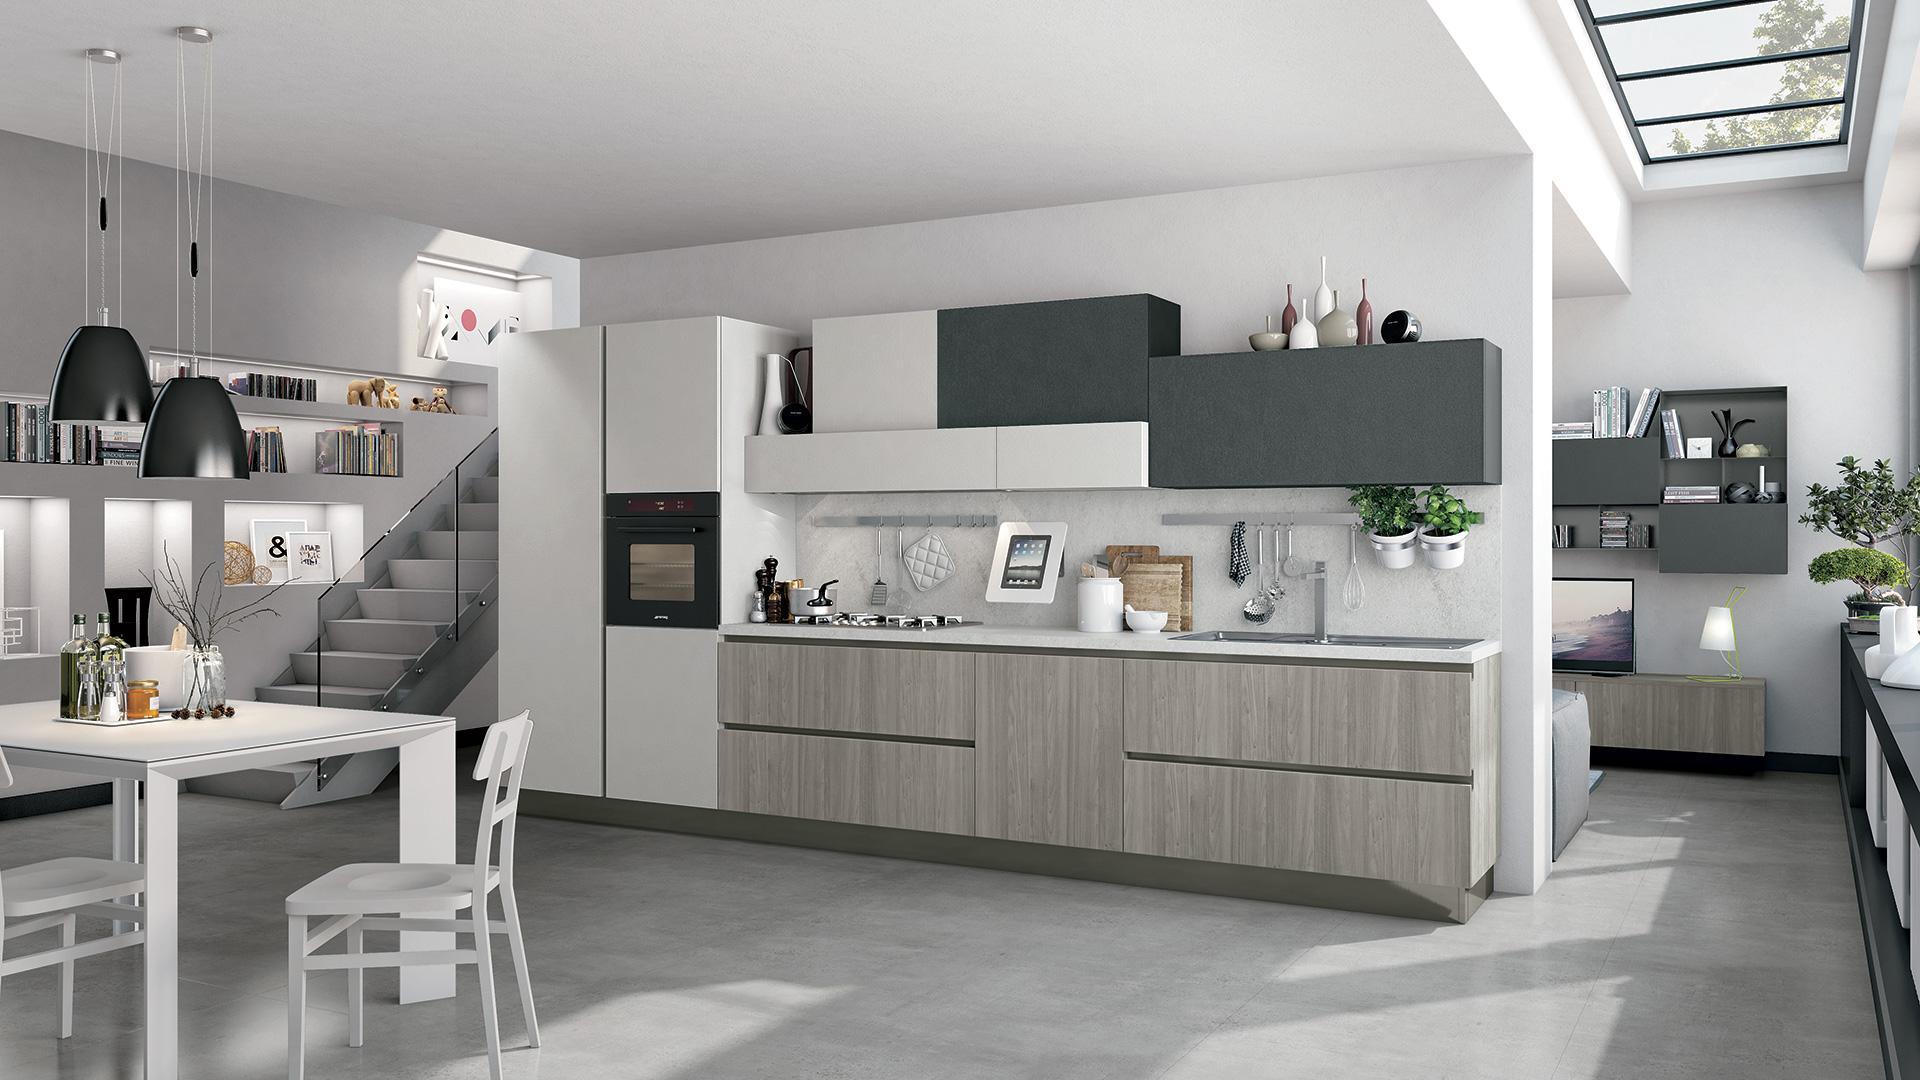 Cucine Moderne Bianche E Grigie Lube.Cucine Moderne Bianche E Grigie Lube